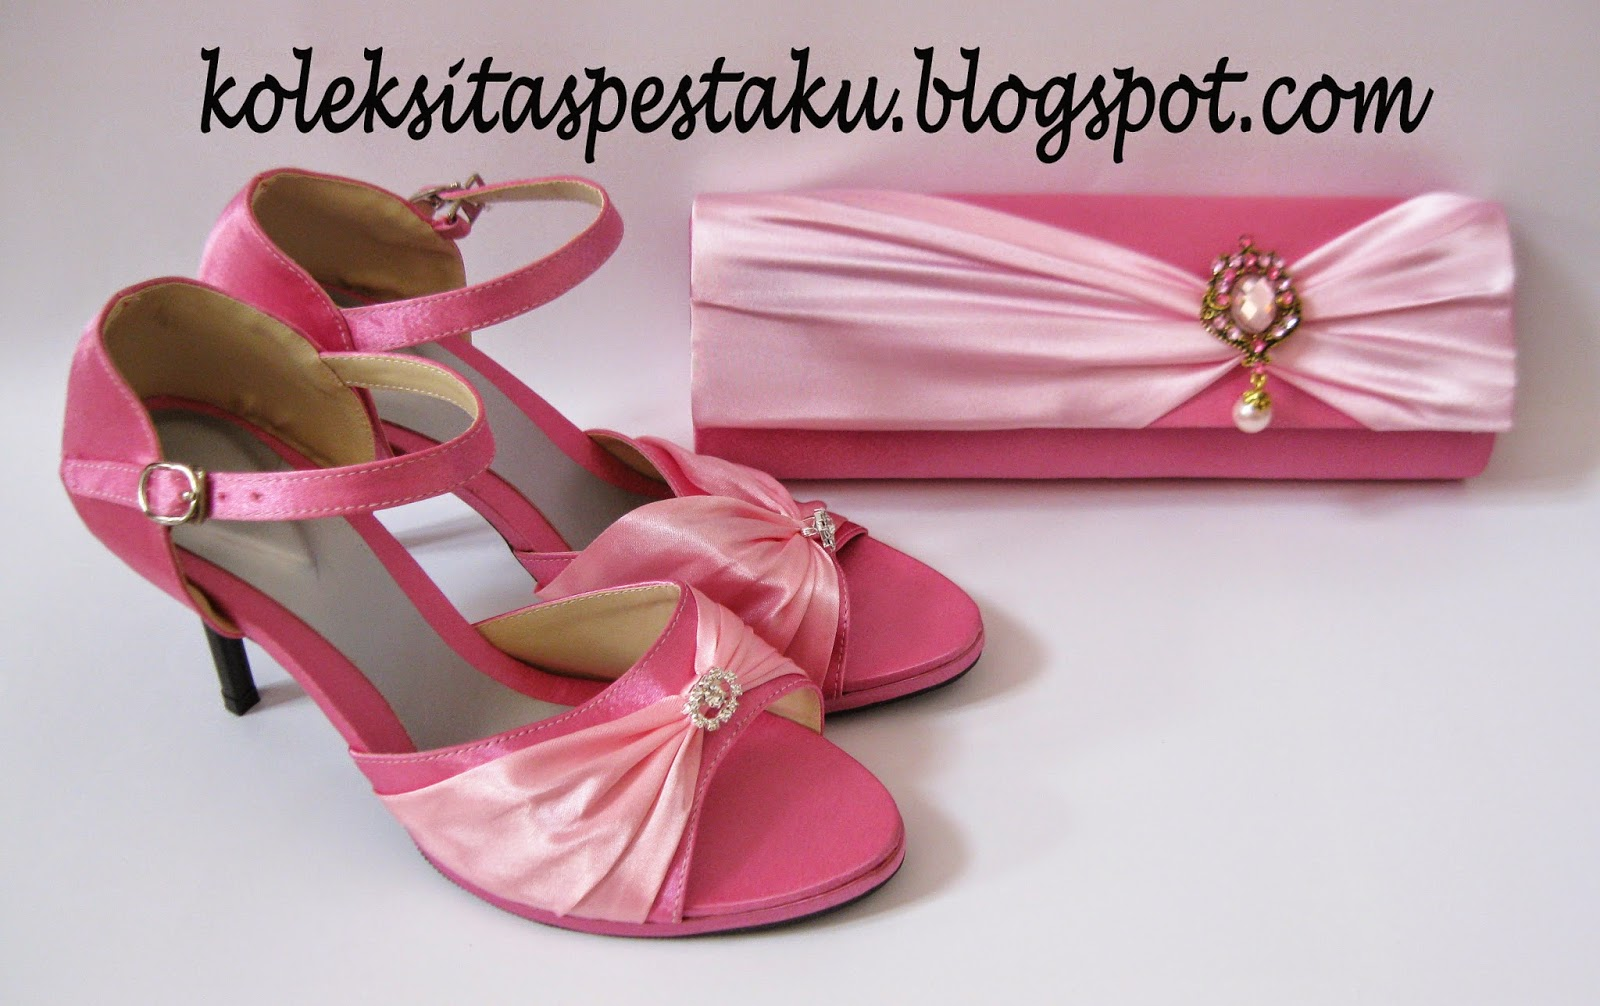 sepatu dan tas pesta cantik pink ayu pink baby bros mewah